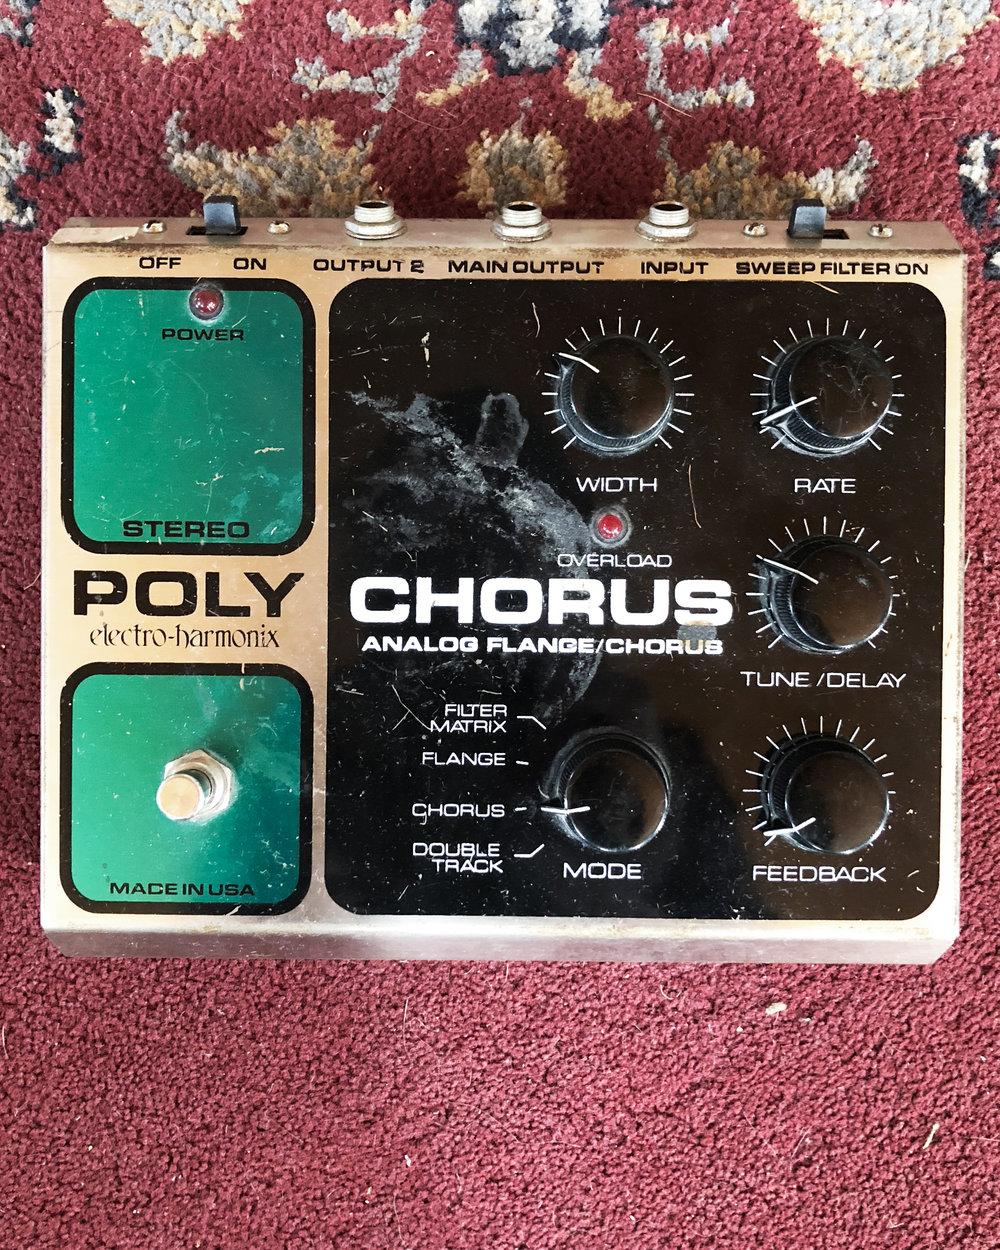 Electro-harmonix Poly Chorus (1998)